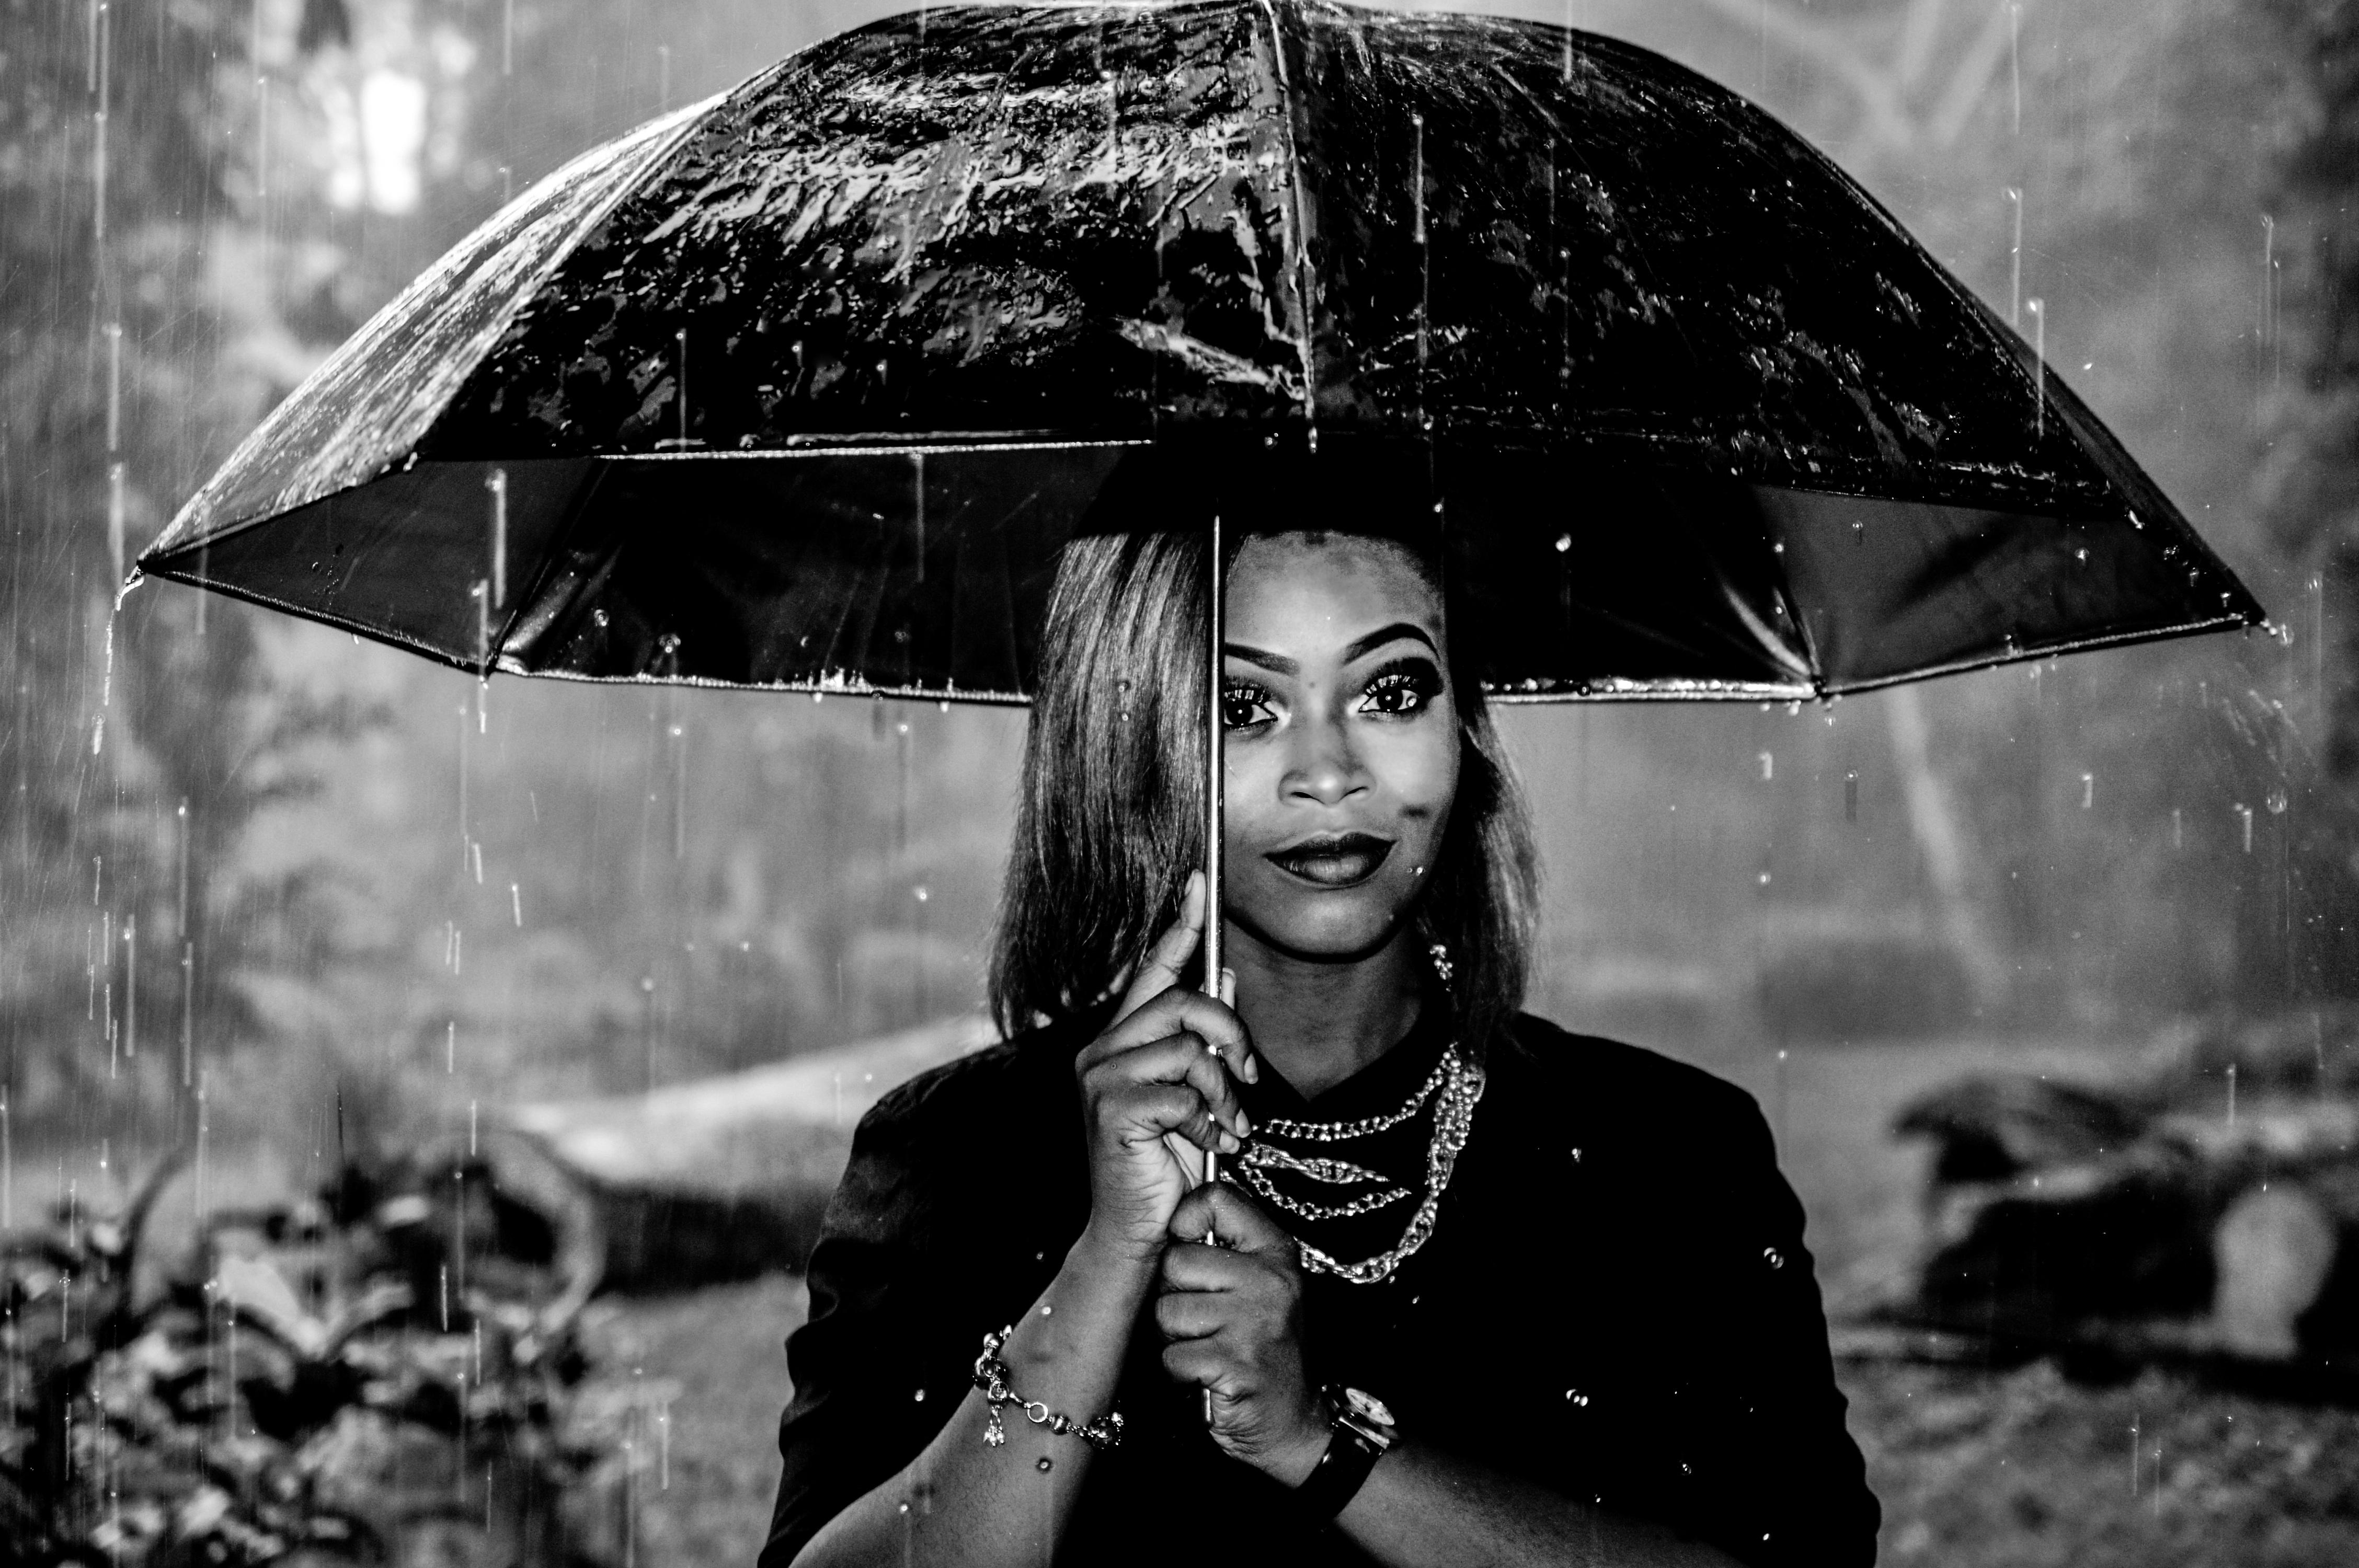 Woman Standing in the Rain Favour Omoruyi